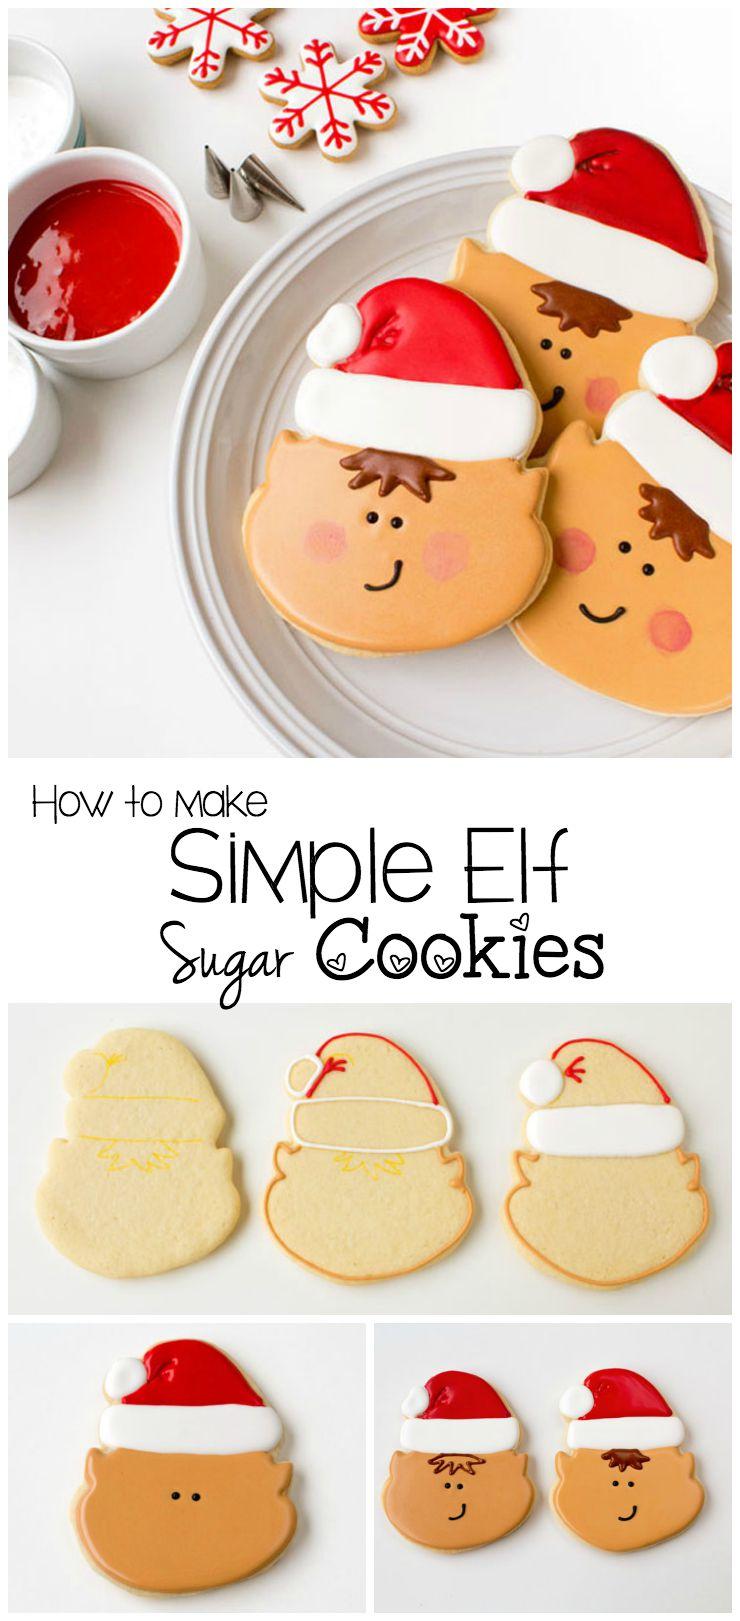 How to Make Simple Elf Cookies | The Bearfoot Baker